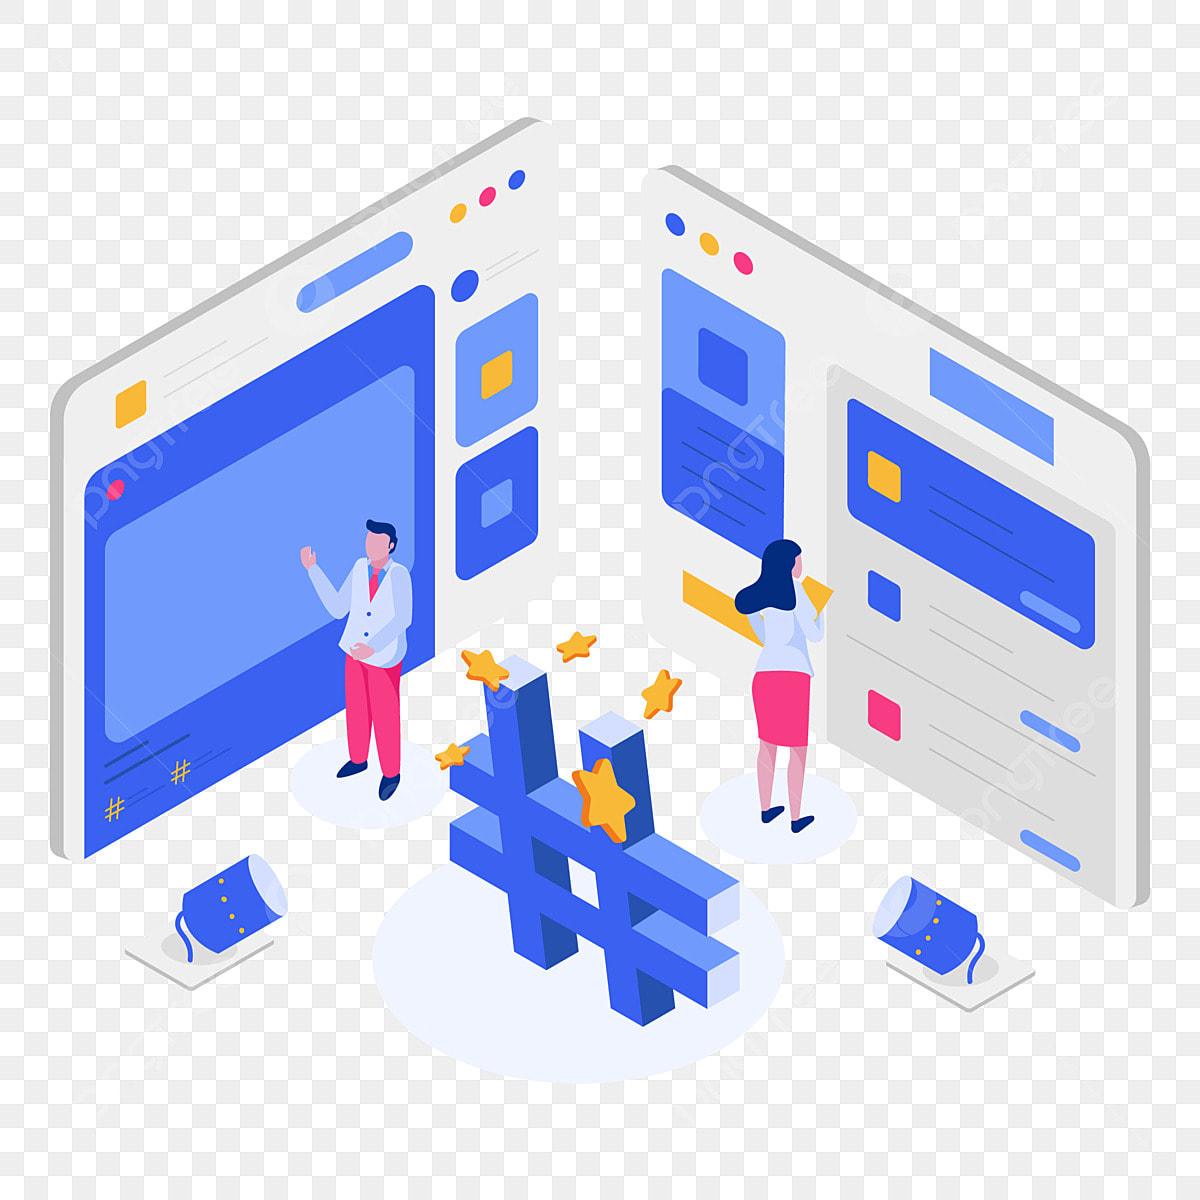 Social Media Hashtags Isometric Illustration Concept